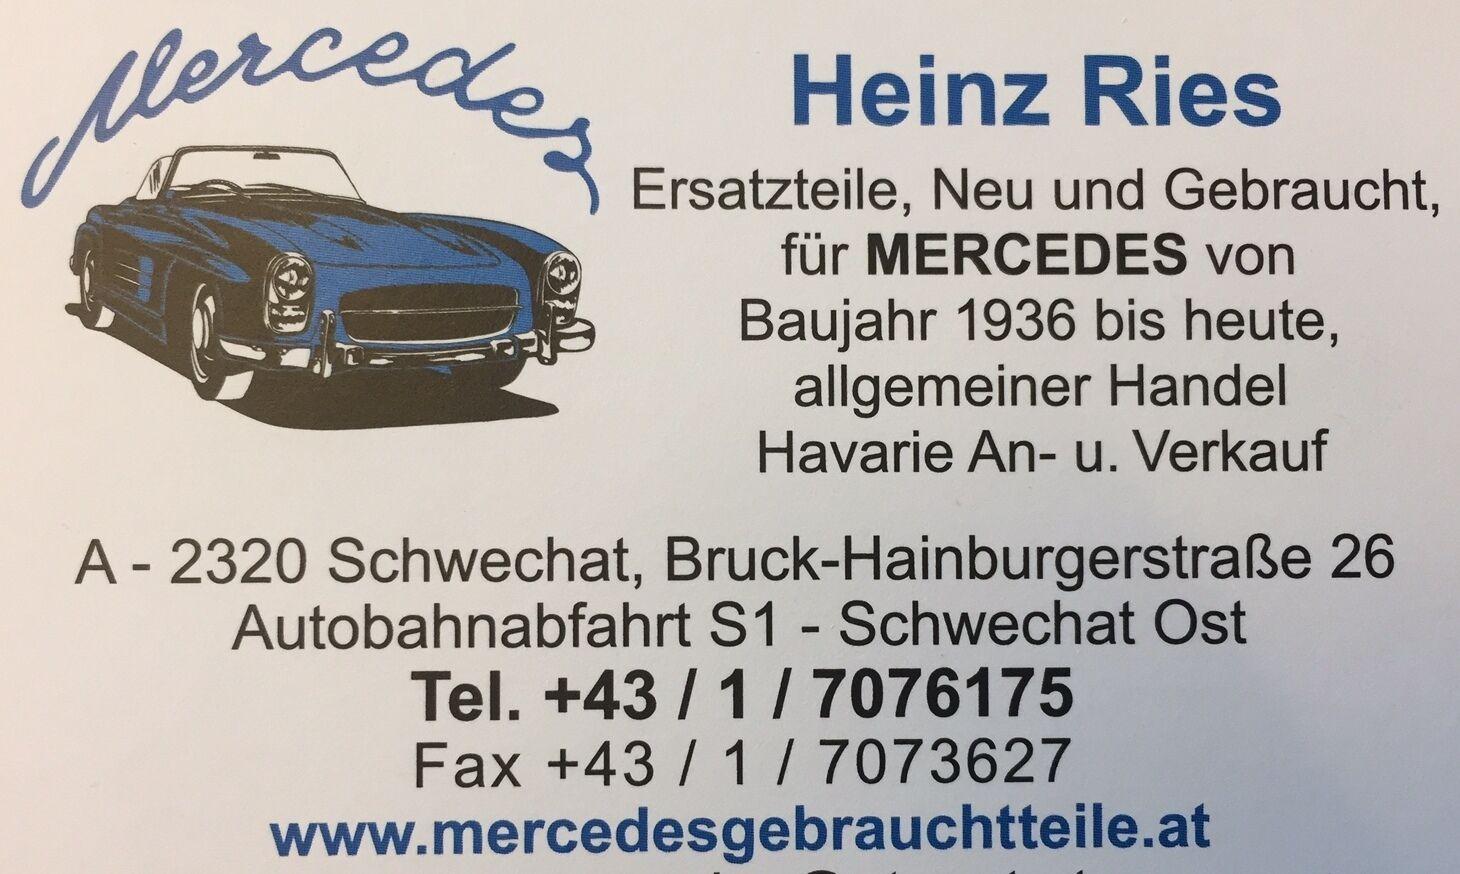 Mercedes Heizungsventil Ventil 2208300184 2208300184 2208300184 W220 S-Klasse W240 Maybach 1147412127 7b024a